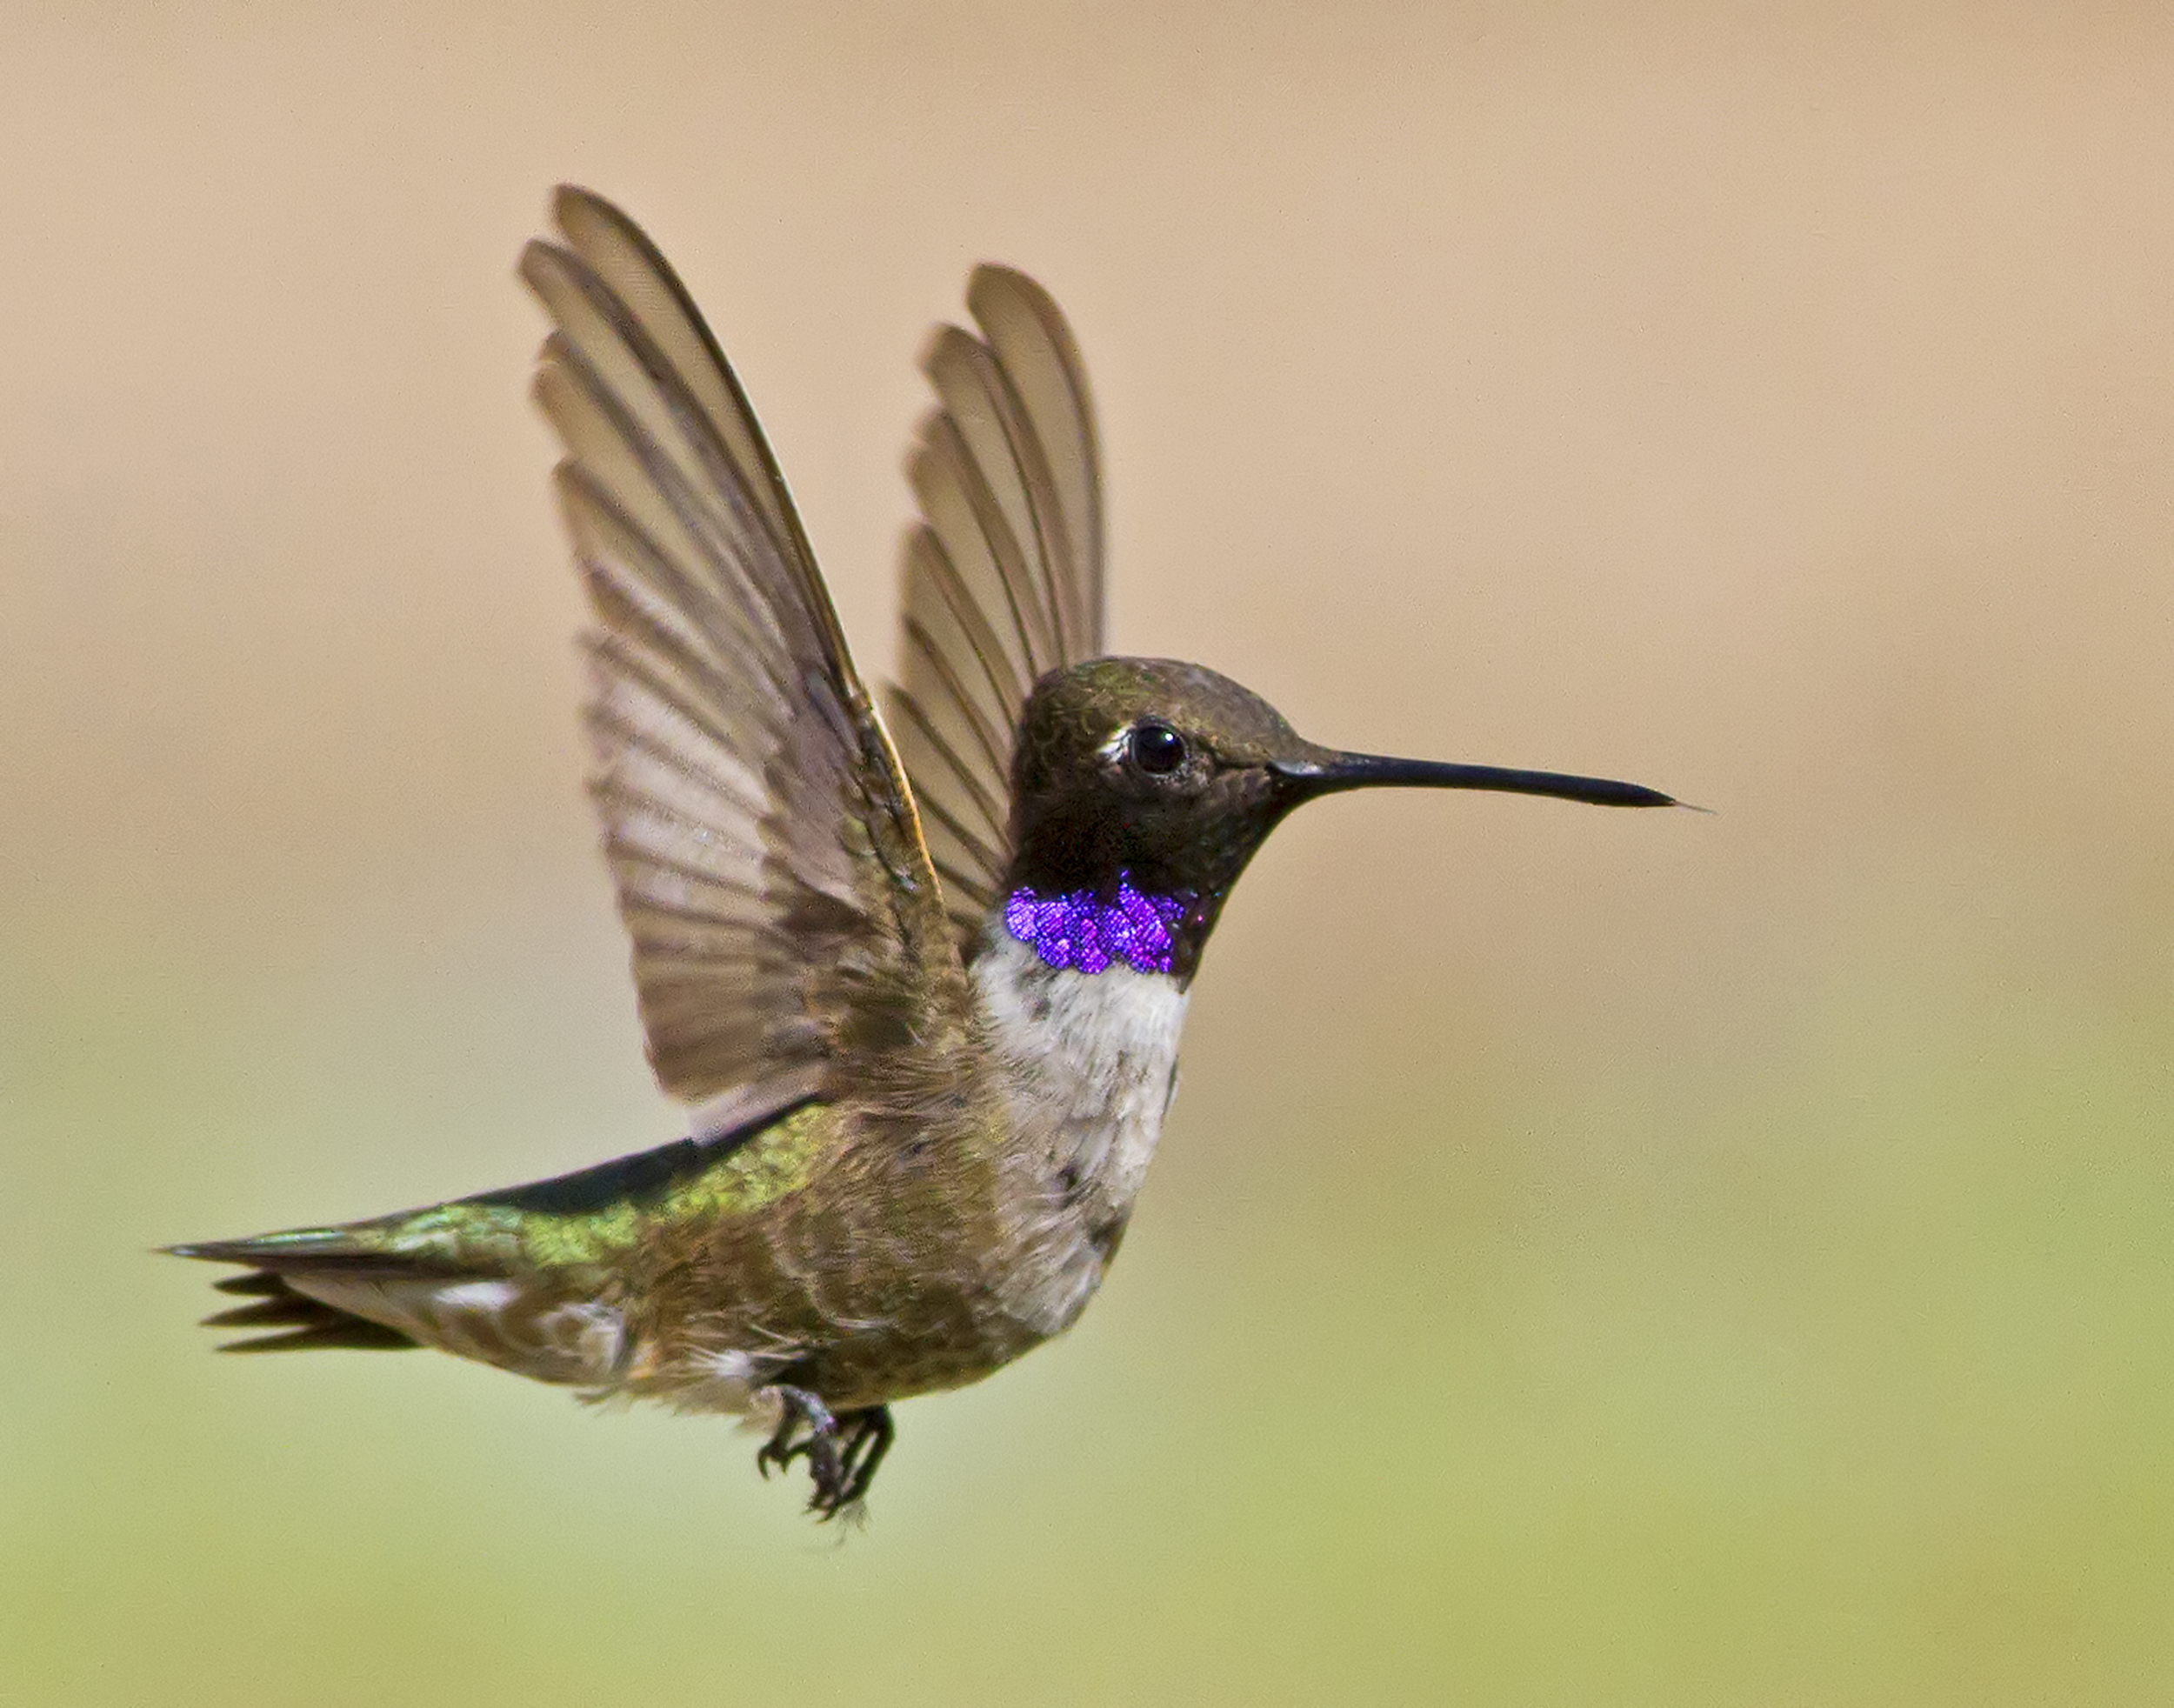 121 - Hummingbird